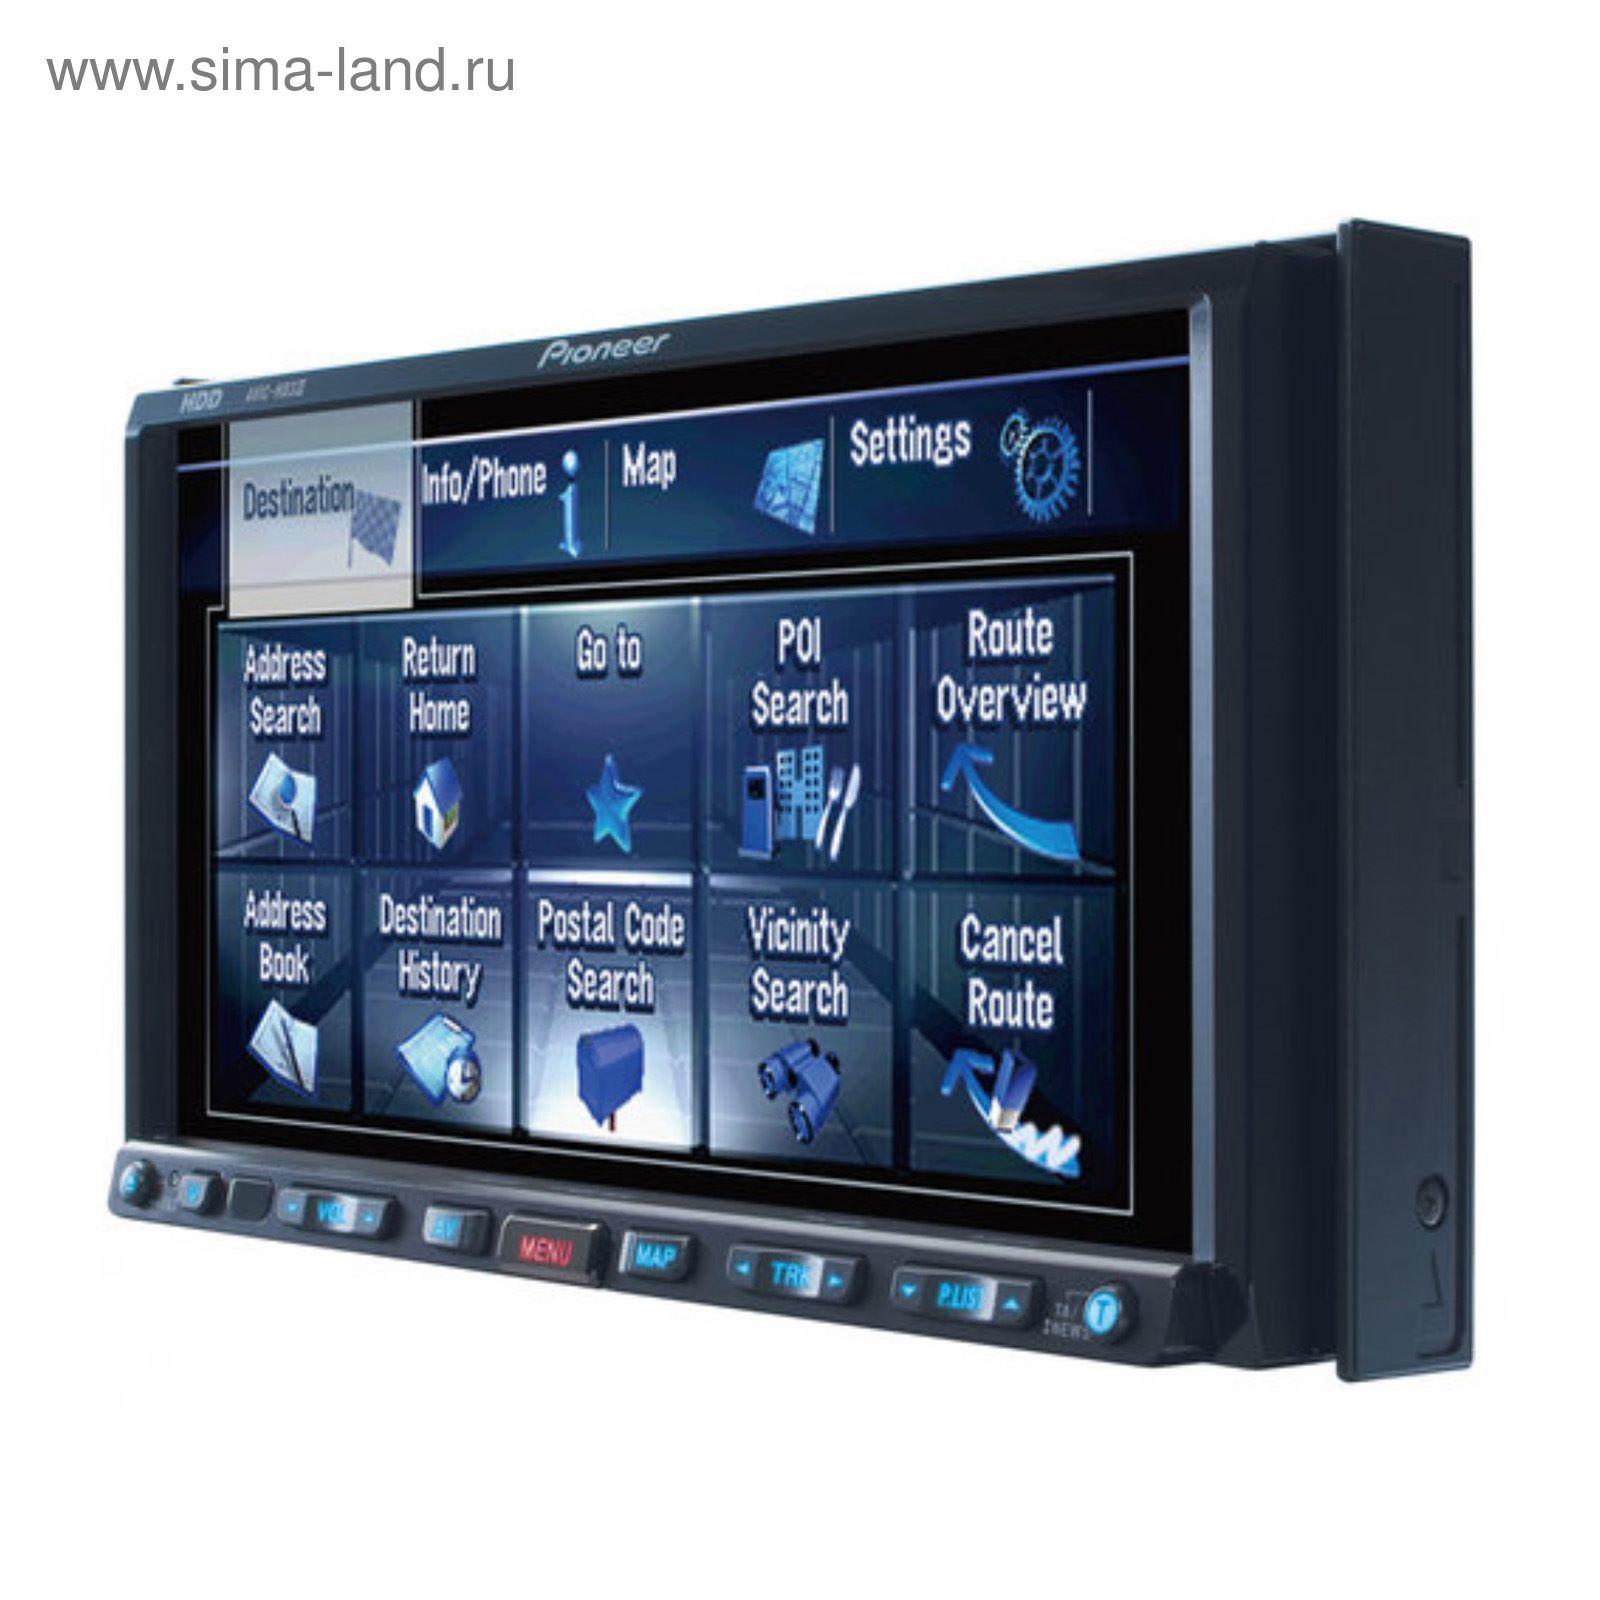 Автомагнитола с монитором и навигацией 2-DIN PIONEER AVIC